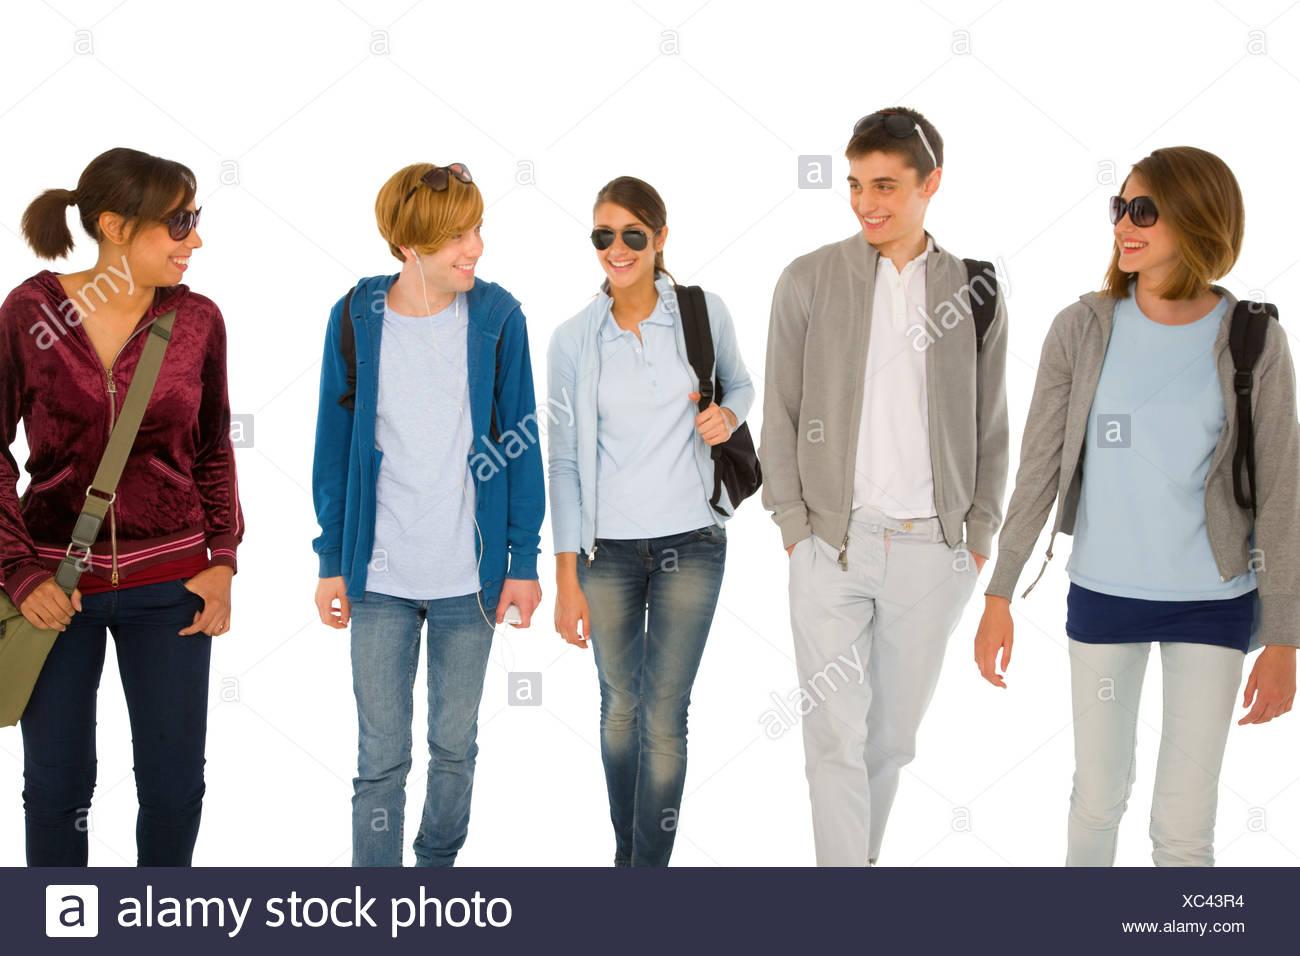 group of teenage students - Stock Image